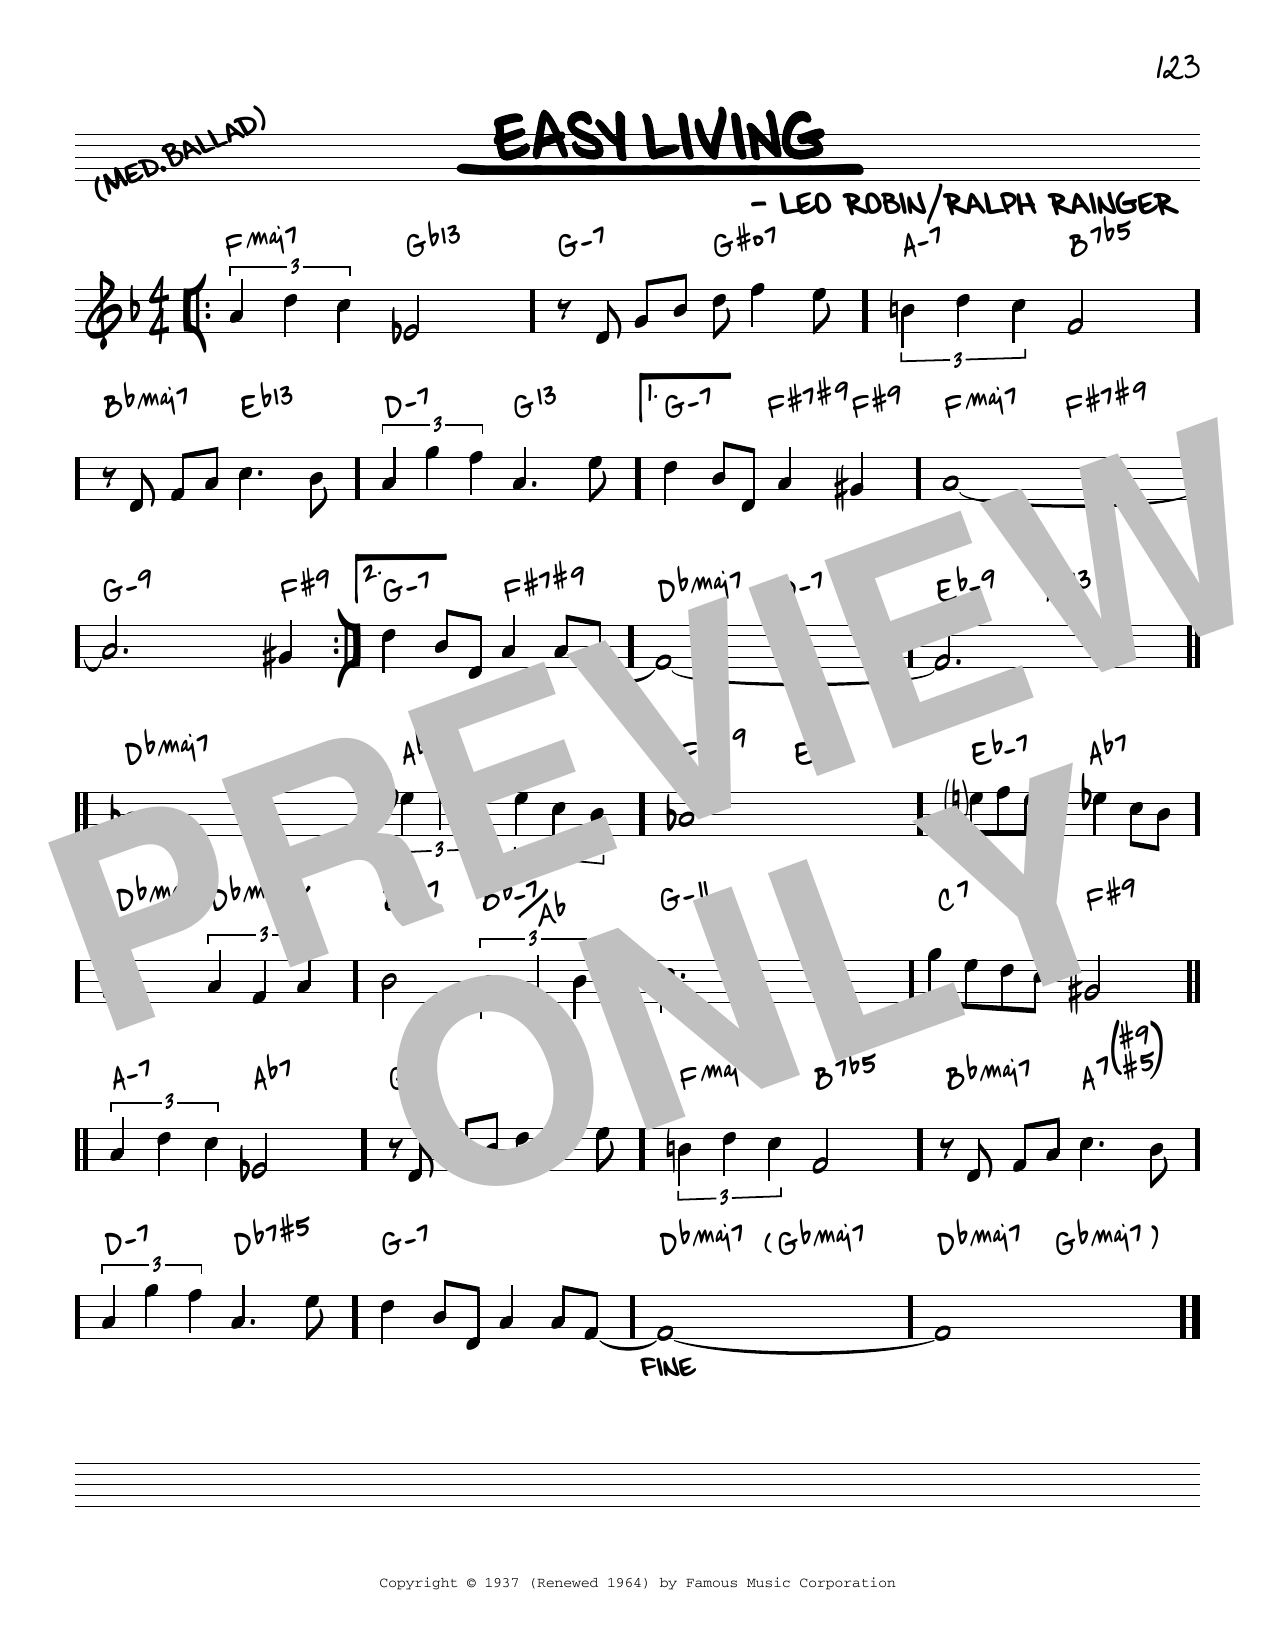 Billie Holiday Easy Living [Reharmonized version] (arr. Jack Grassel) sheet music notes printable PDF score